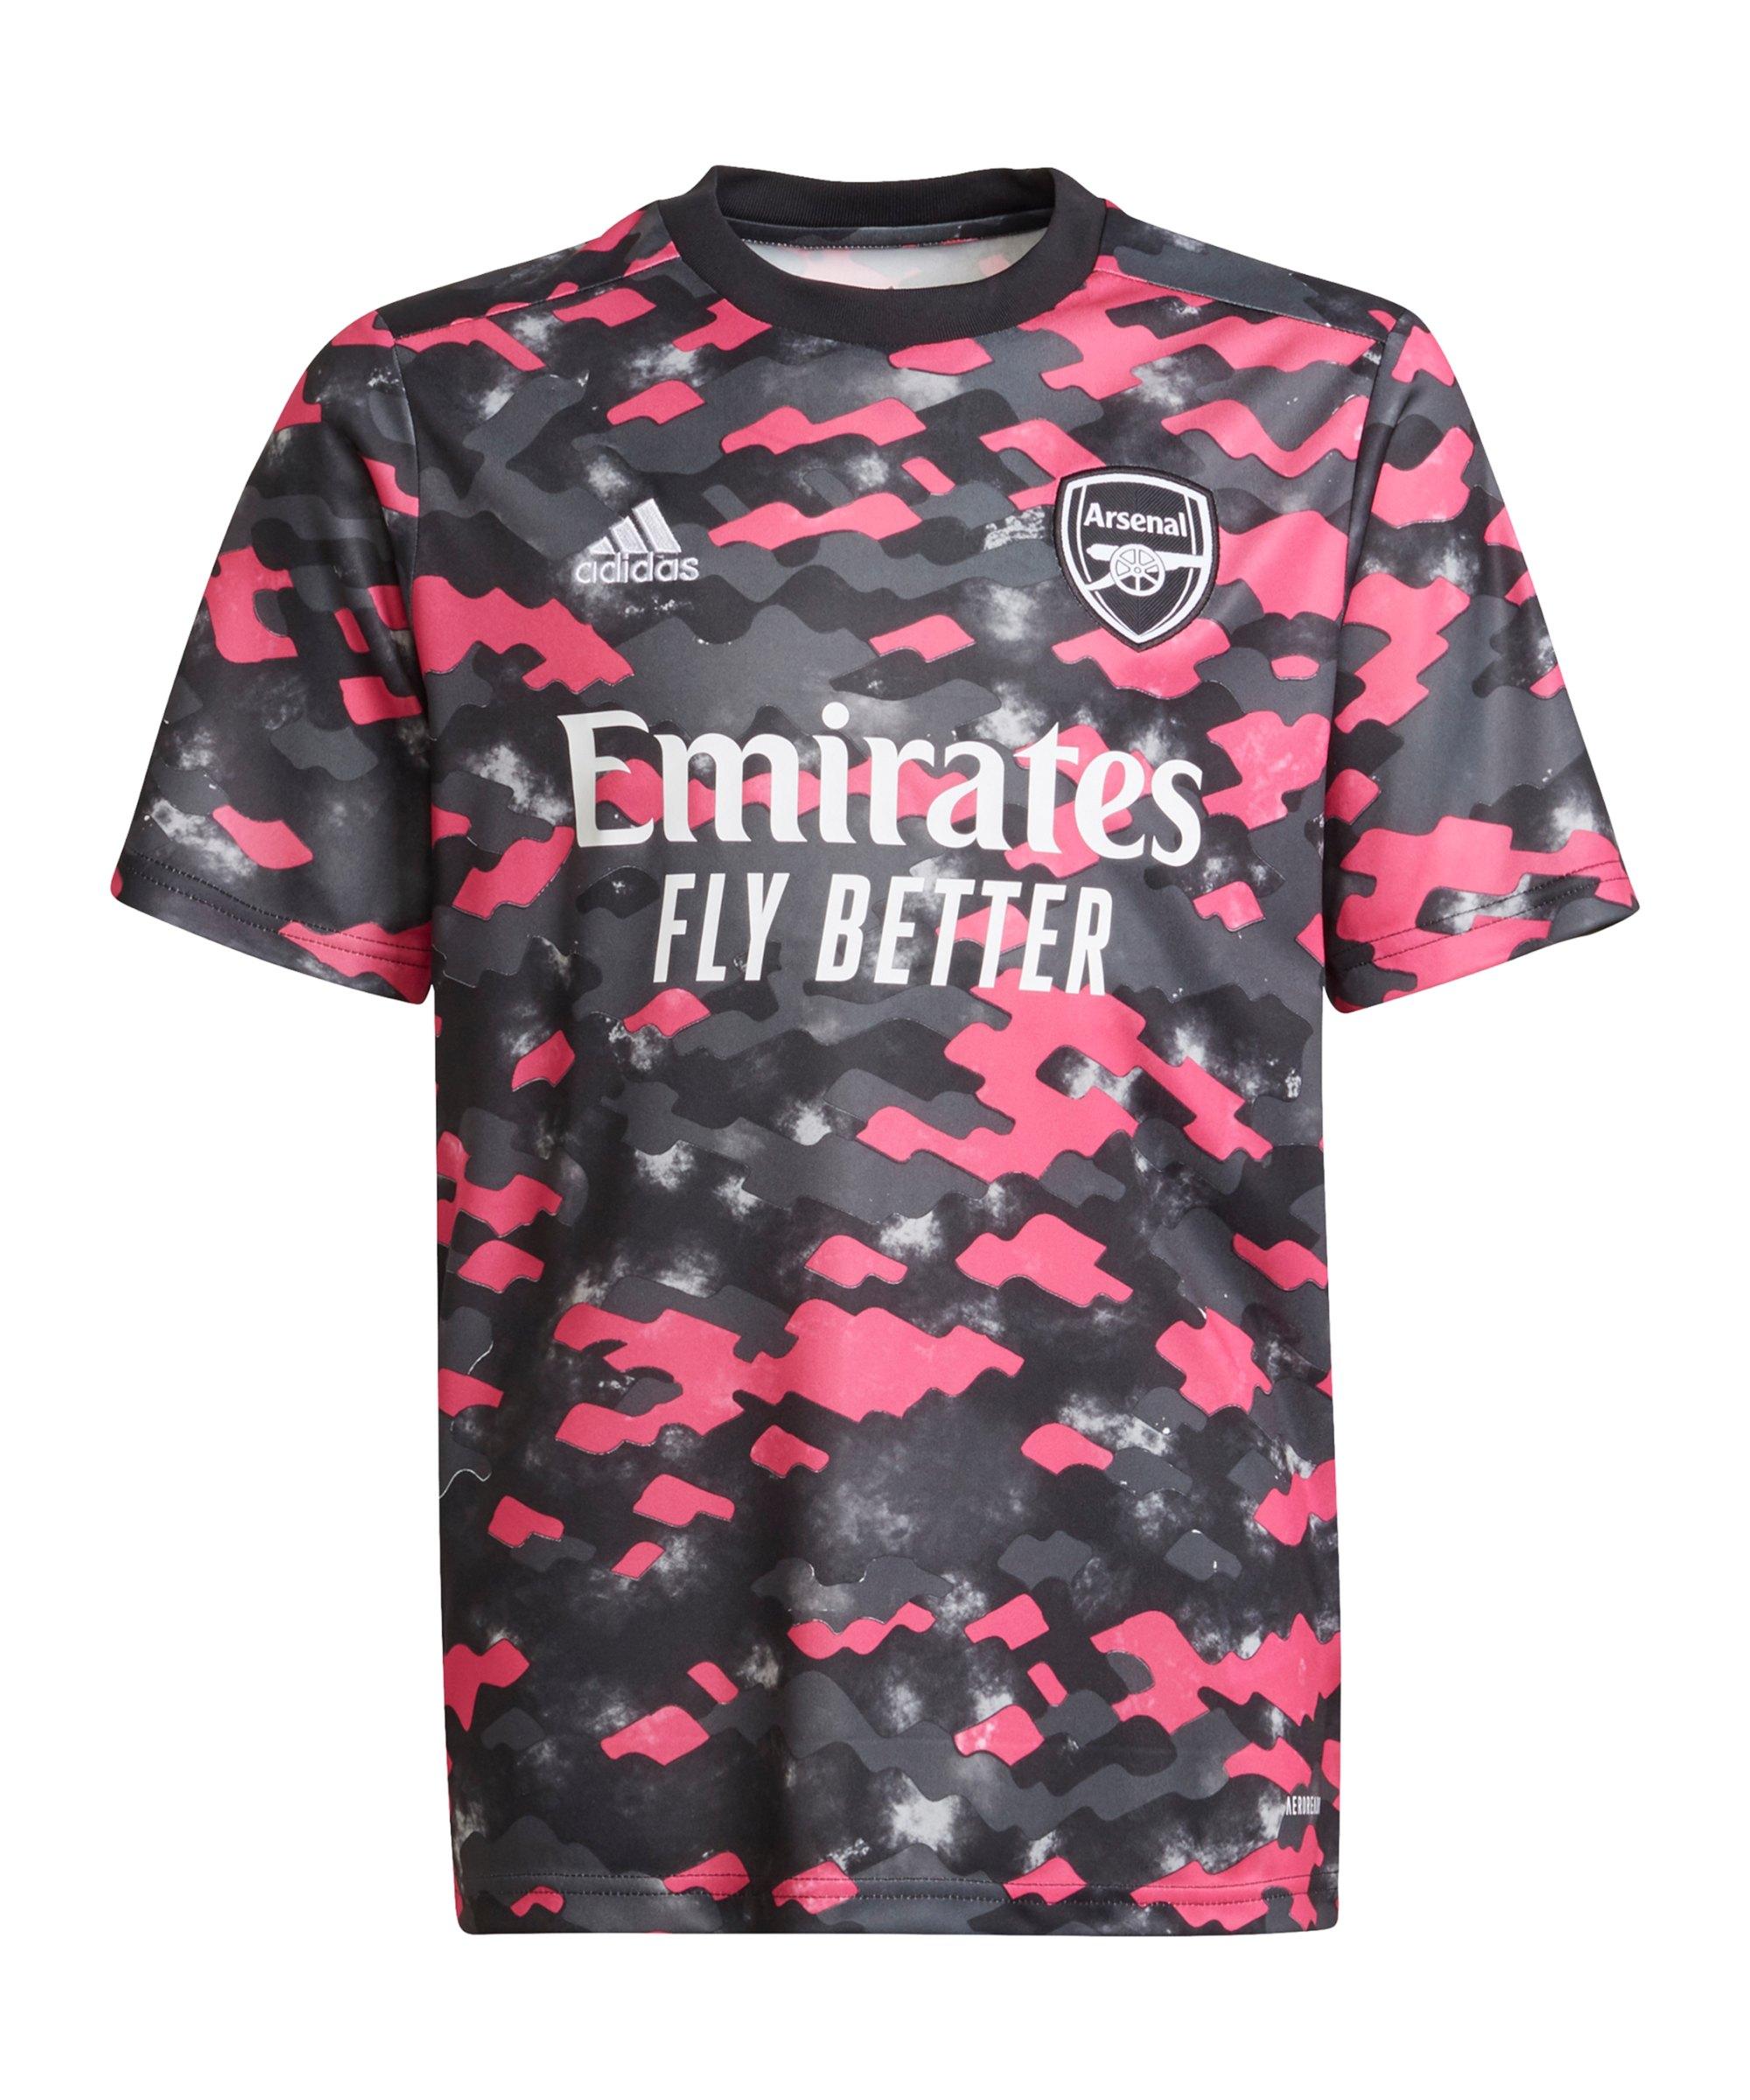 adidas FC Arsenal London Prematch Shirt 2021/2022 Kids Pink Schwarz - pink